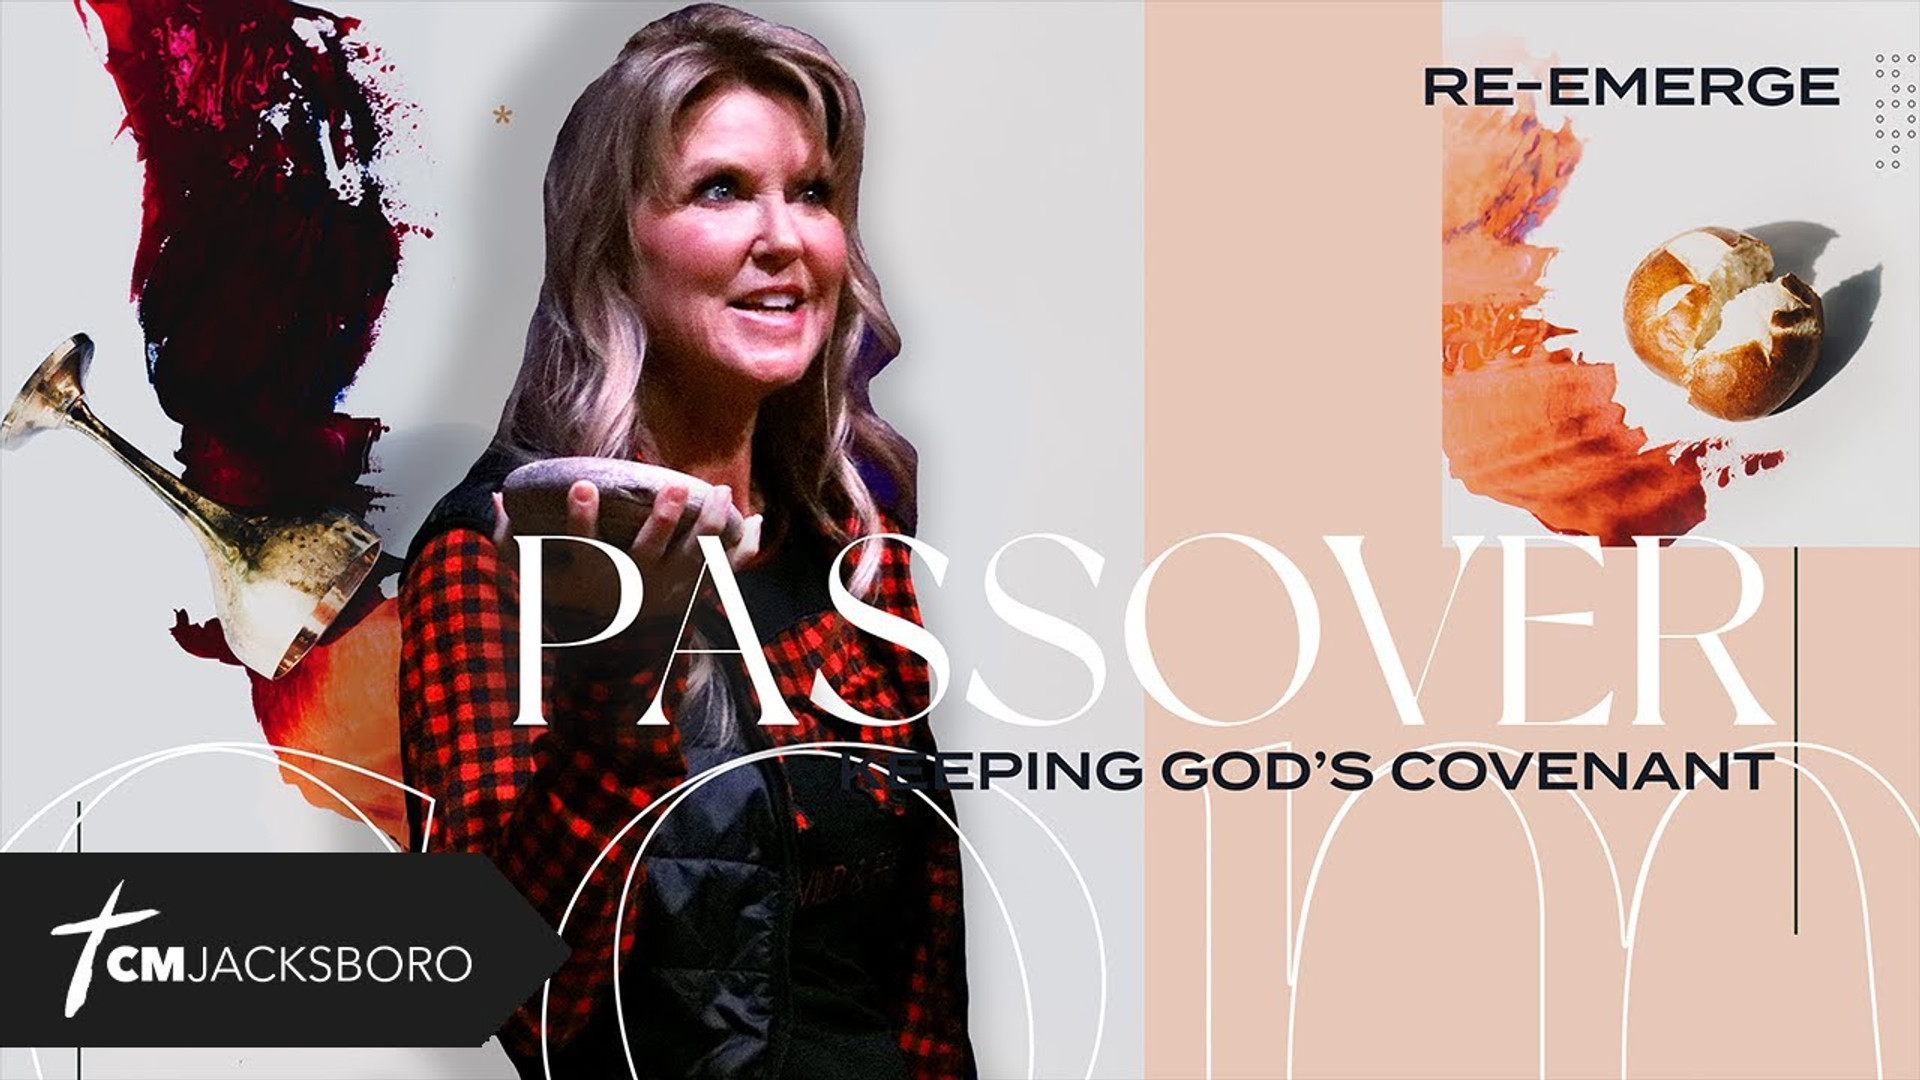 Passover | Re-Emerge